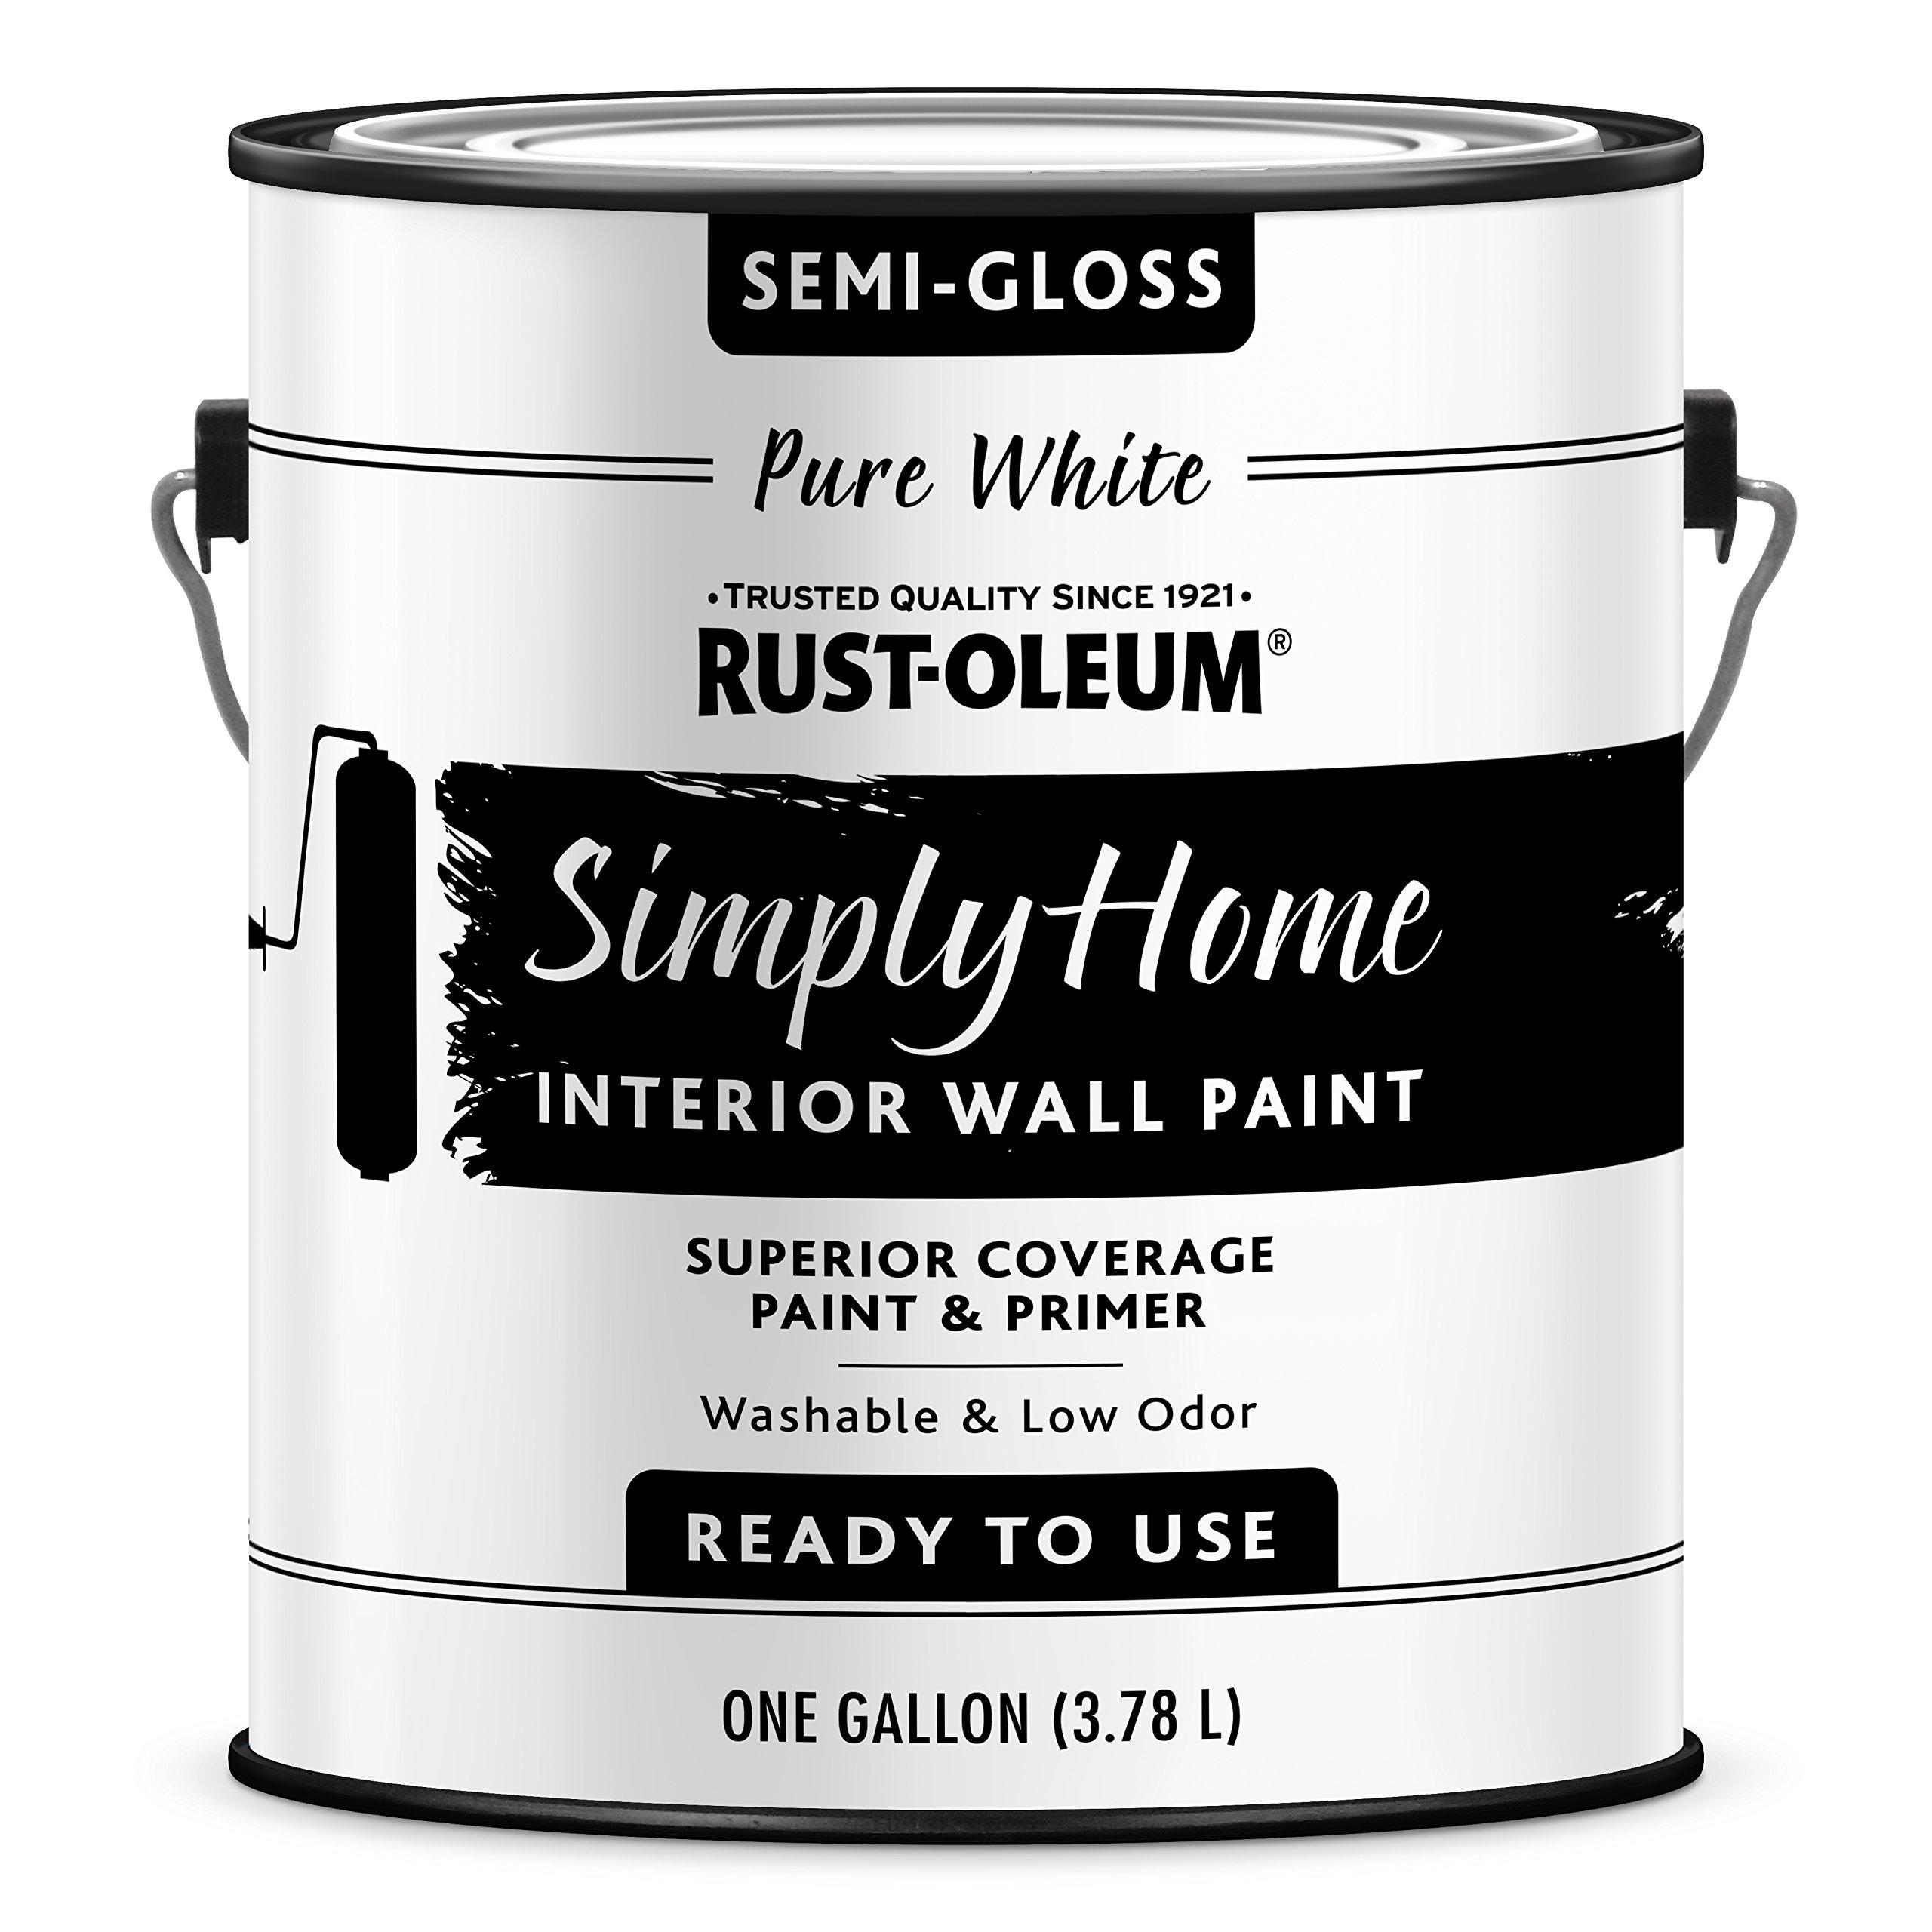 Rust-Oleum 332120-2PK Simply Home Interior Wall Paint, Gallon, Semi-Gloss Pure White